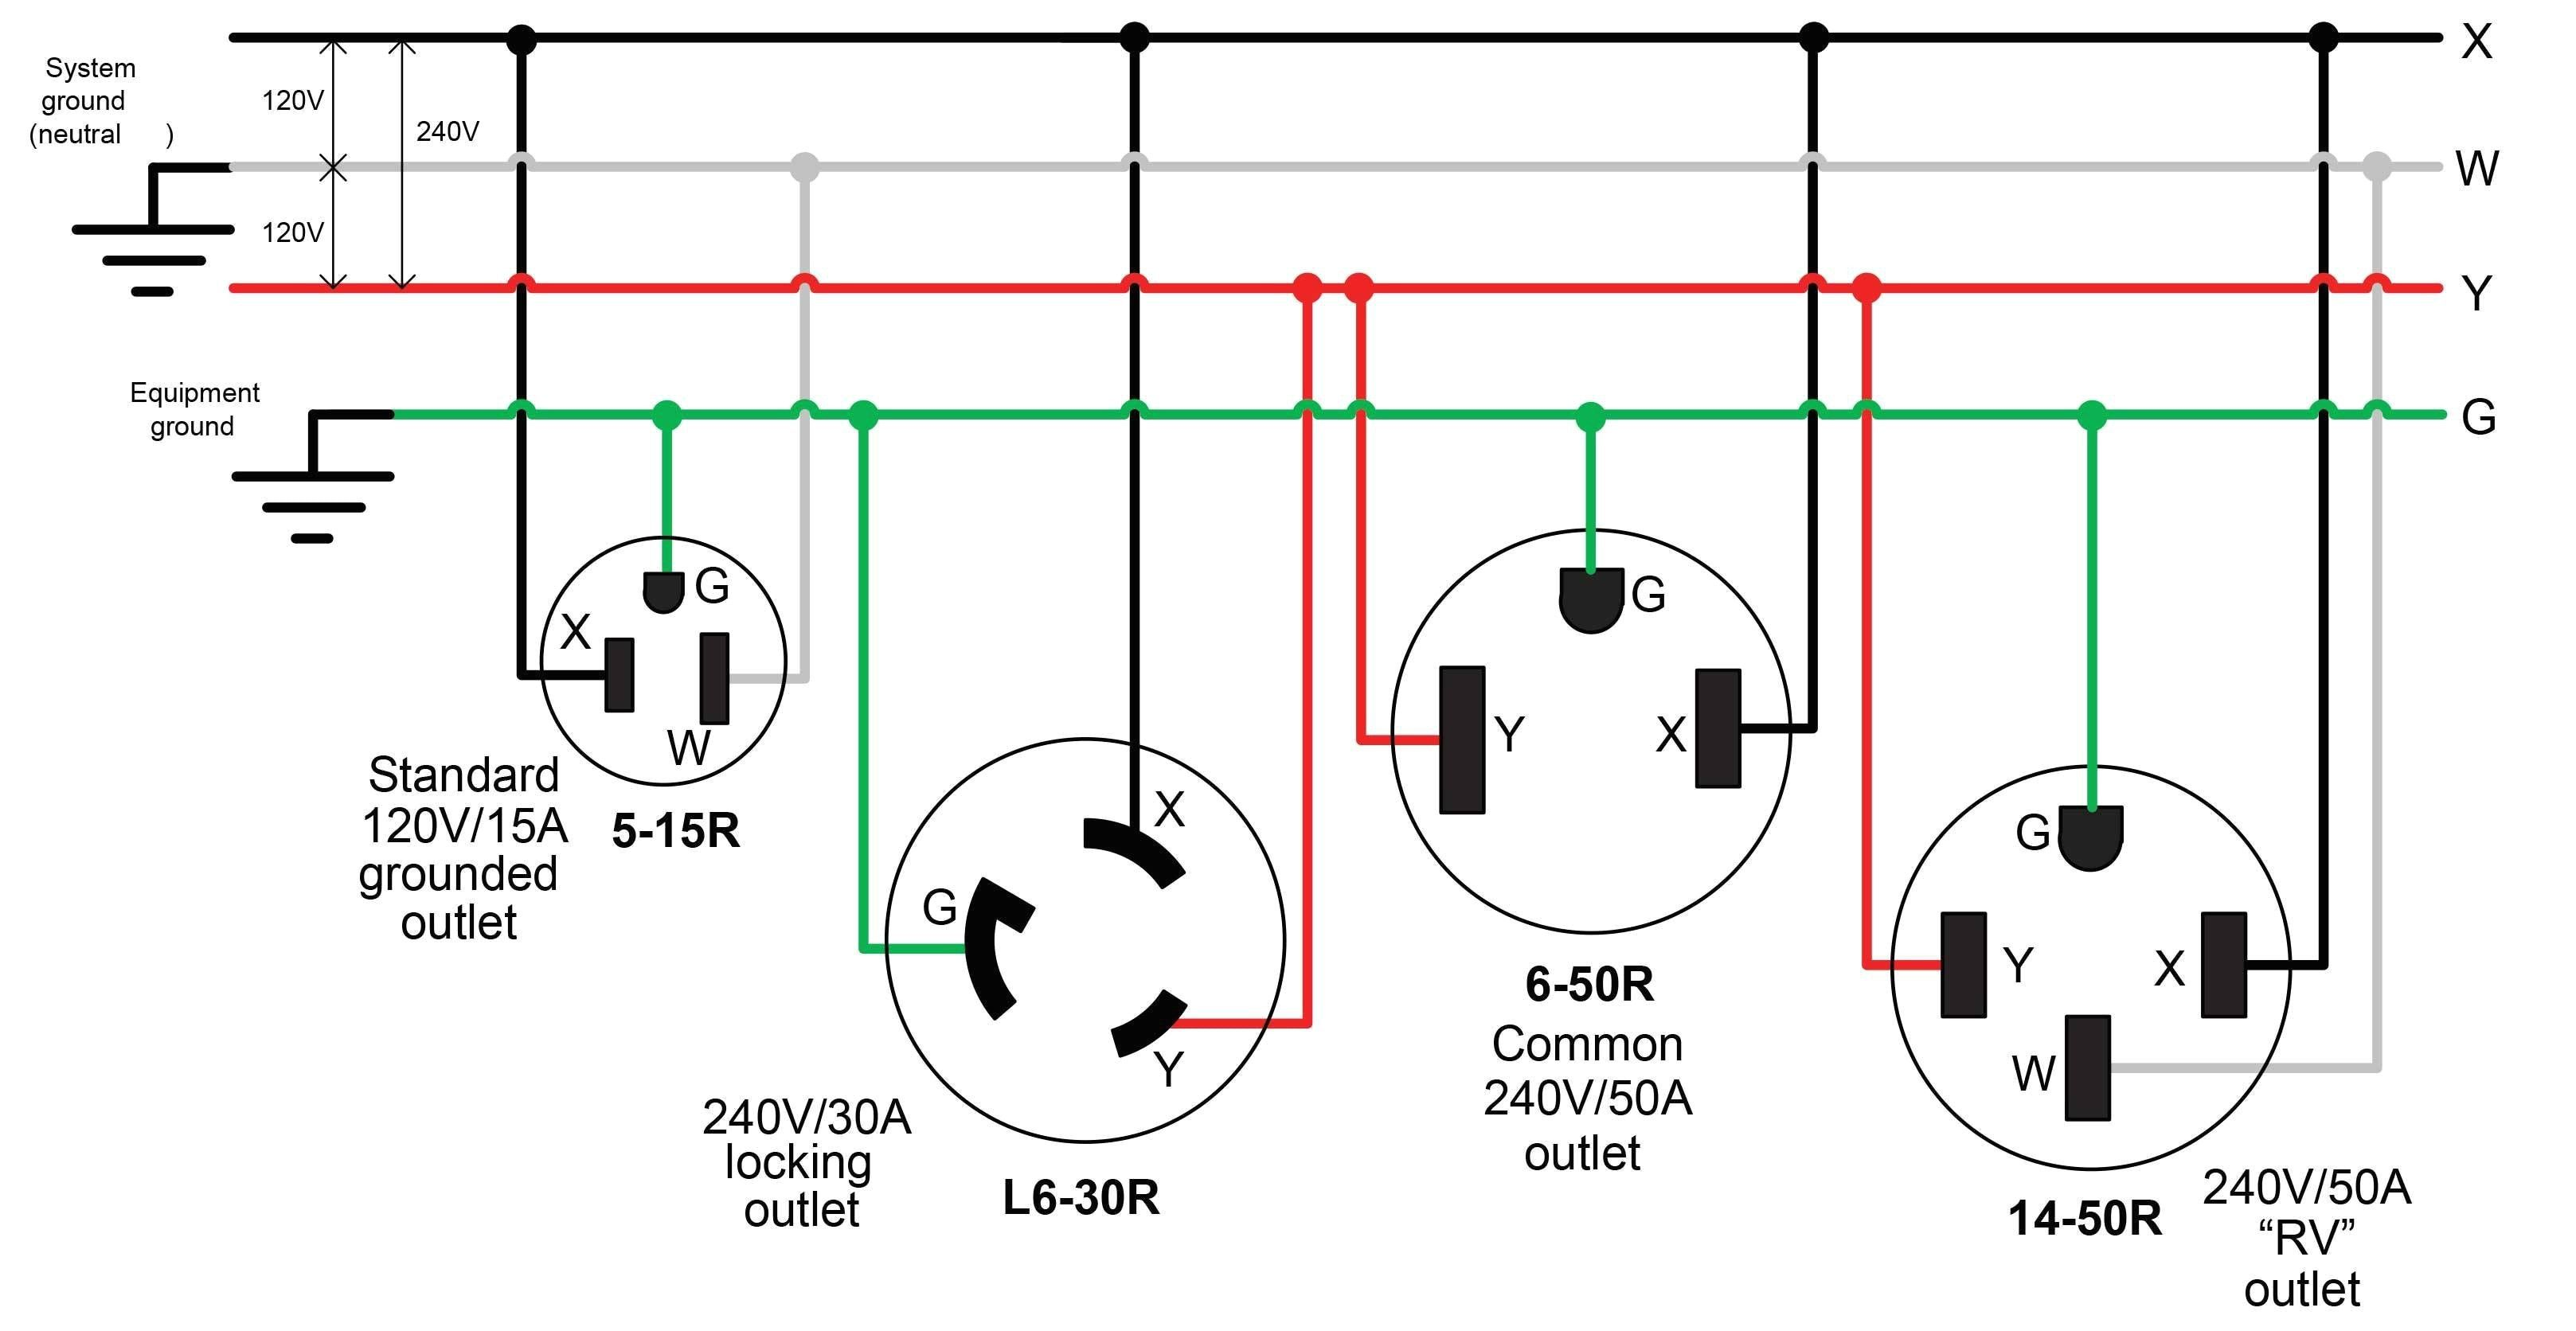 230v generator wiring diagram bei encoder single phase receptacle odnscm danielaharde de rh 68 malibustixx